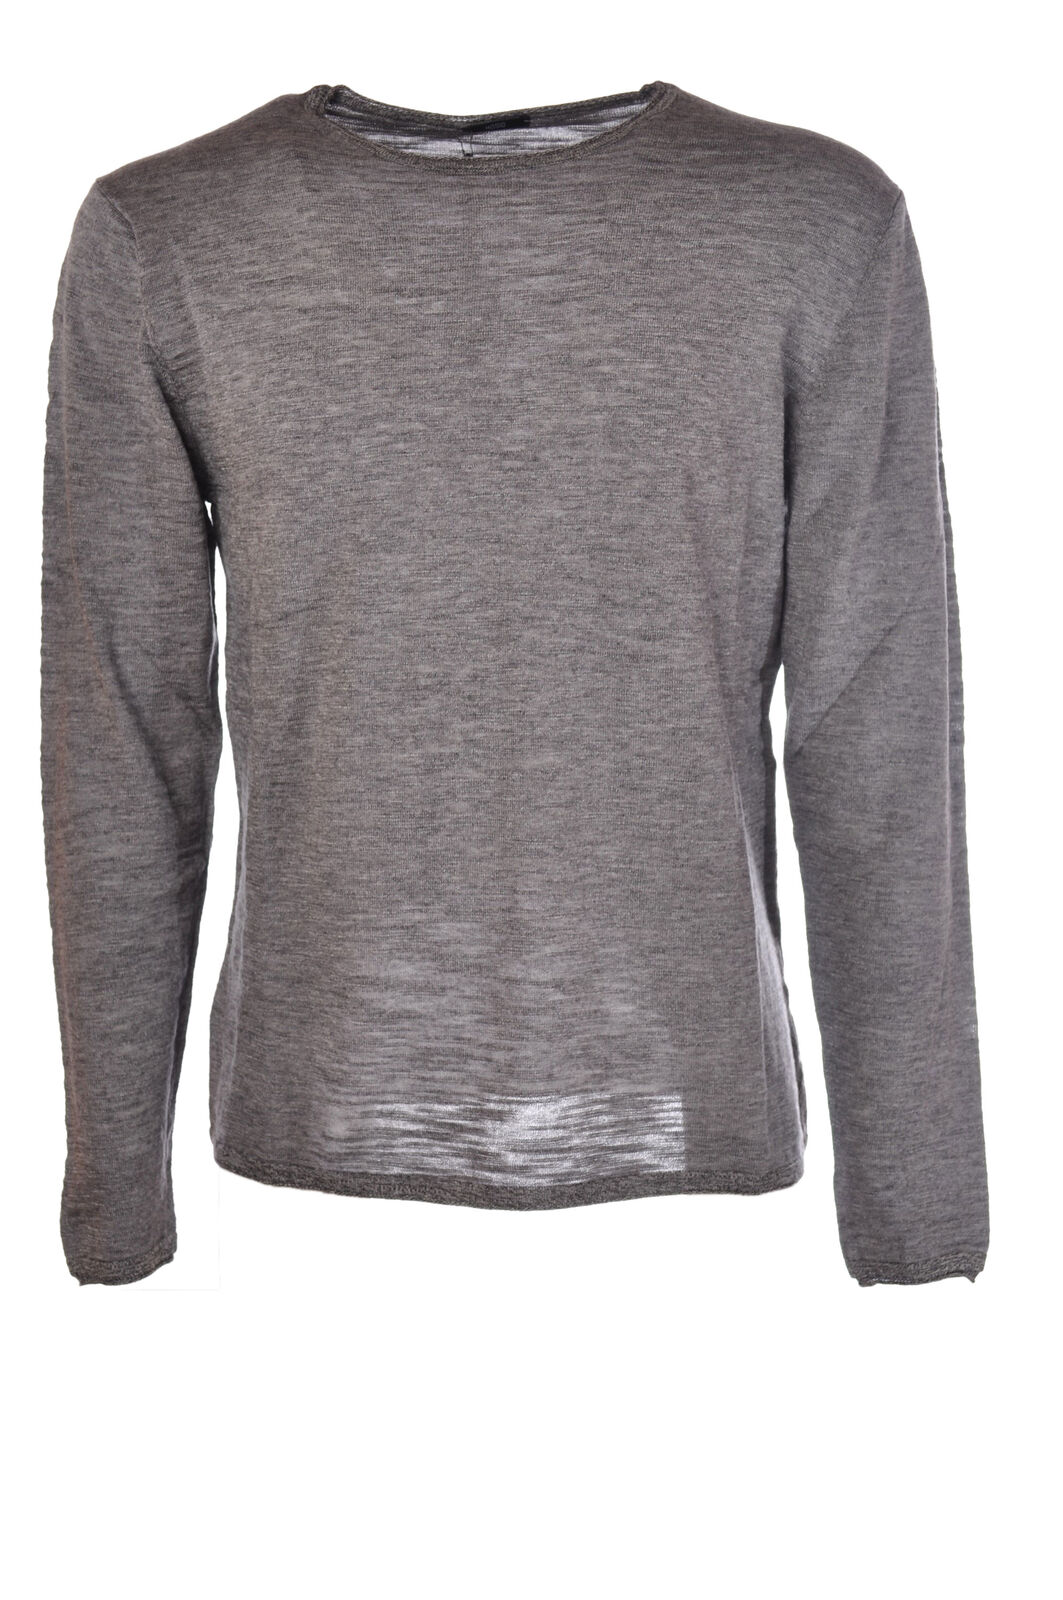 Hosio  -  Sweaters - Male - Grau - 2788008A183857